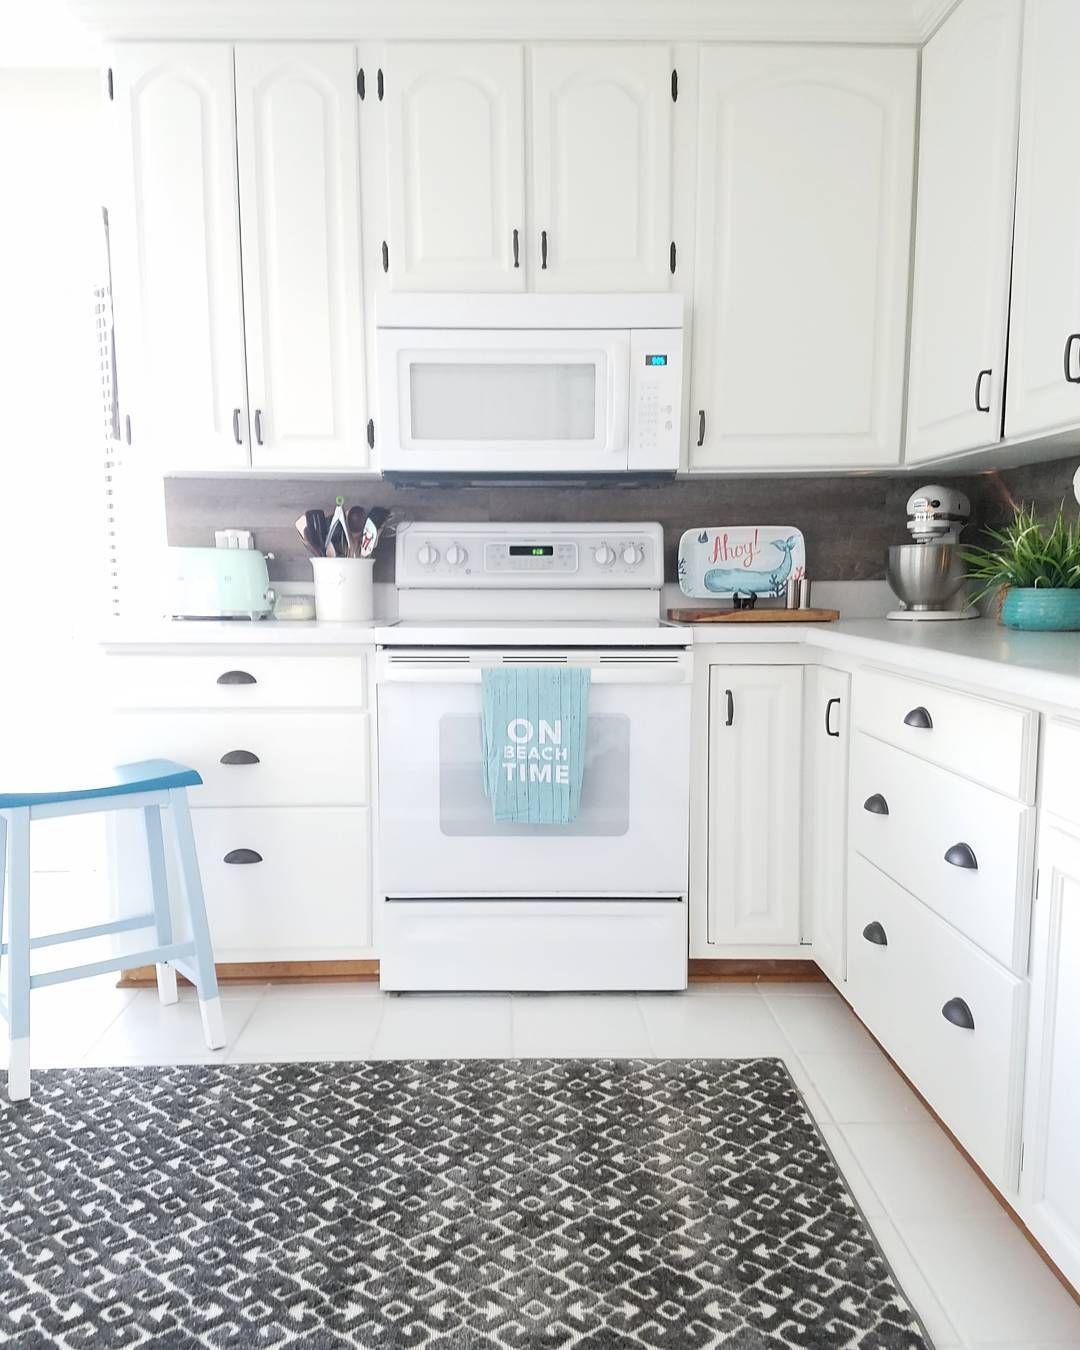 Painted Kitchen Cabinets Sherwin Williams Pro Classic Alabaster Kitchen Paint Kitchen Cabinets Painting Kitchen Cabinets